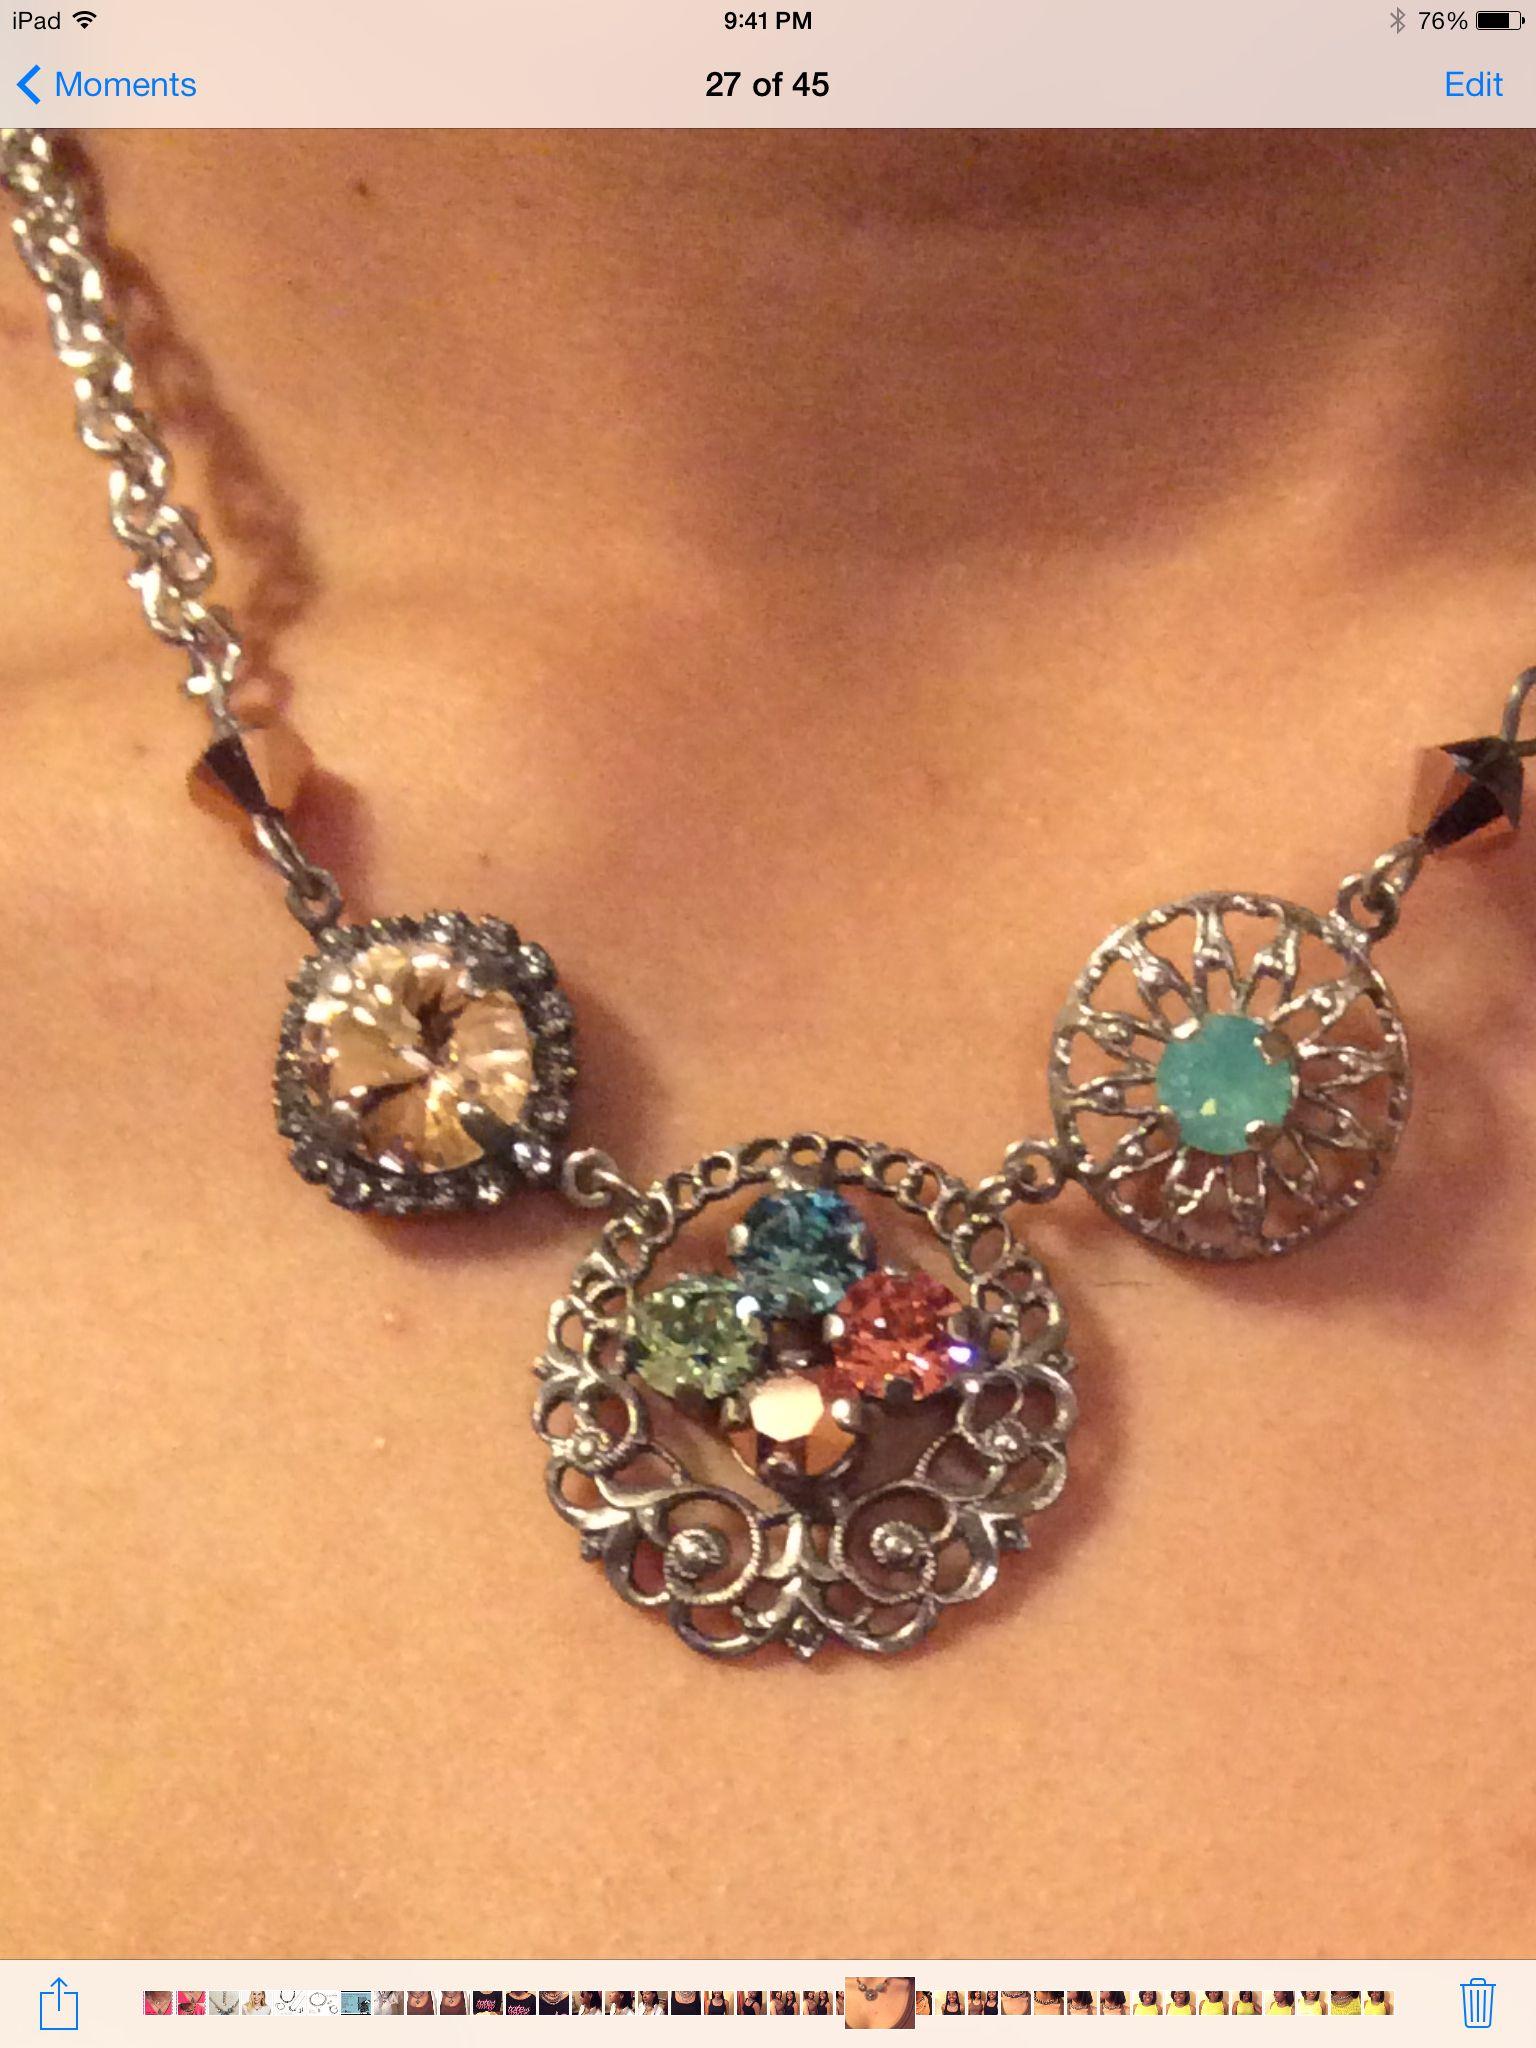 Sabika look necklace - Tray 1 Kindred Spirit Choker